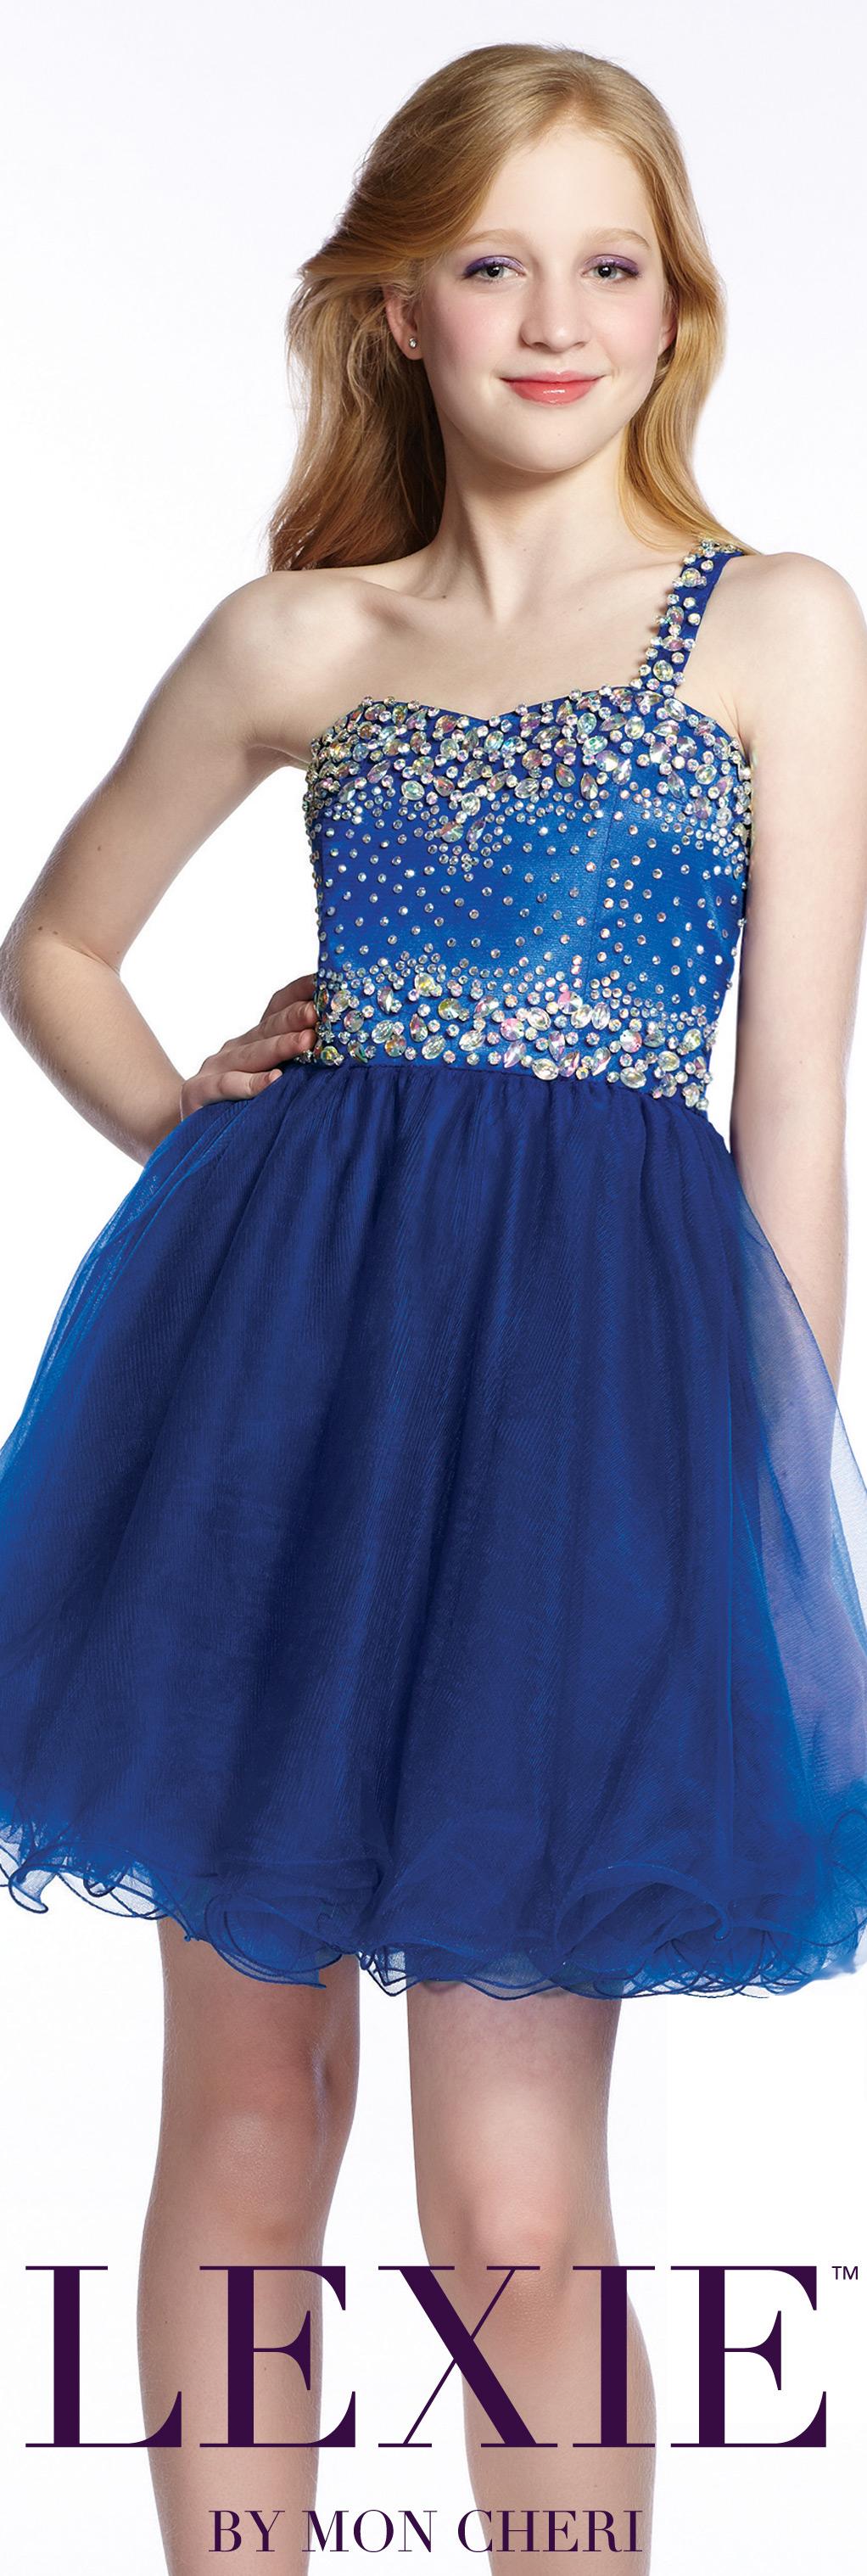 Lexie by Mon Cheri - Tween Formal Dress - Style No. TW21538 ...